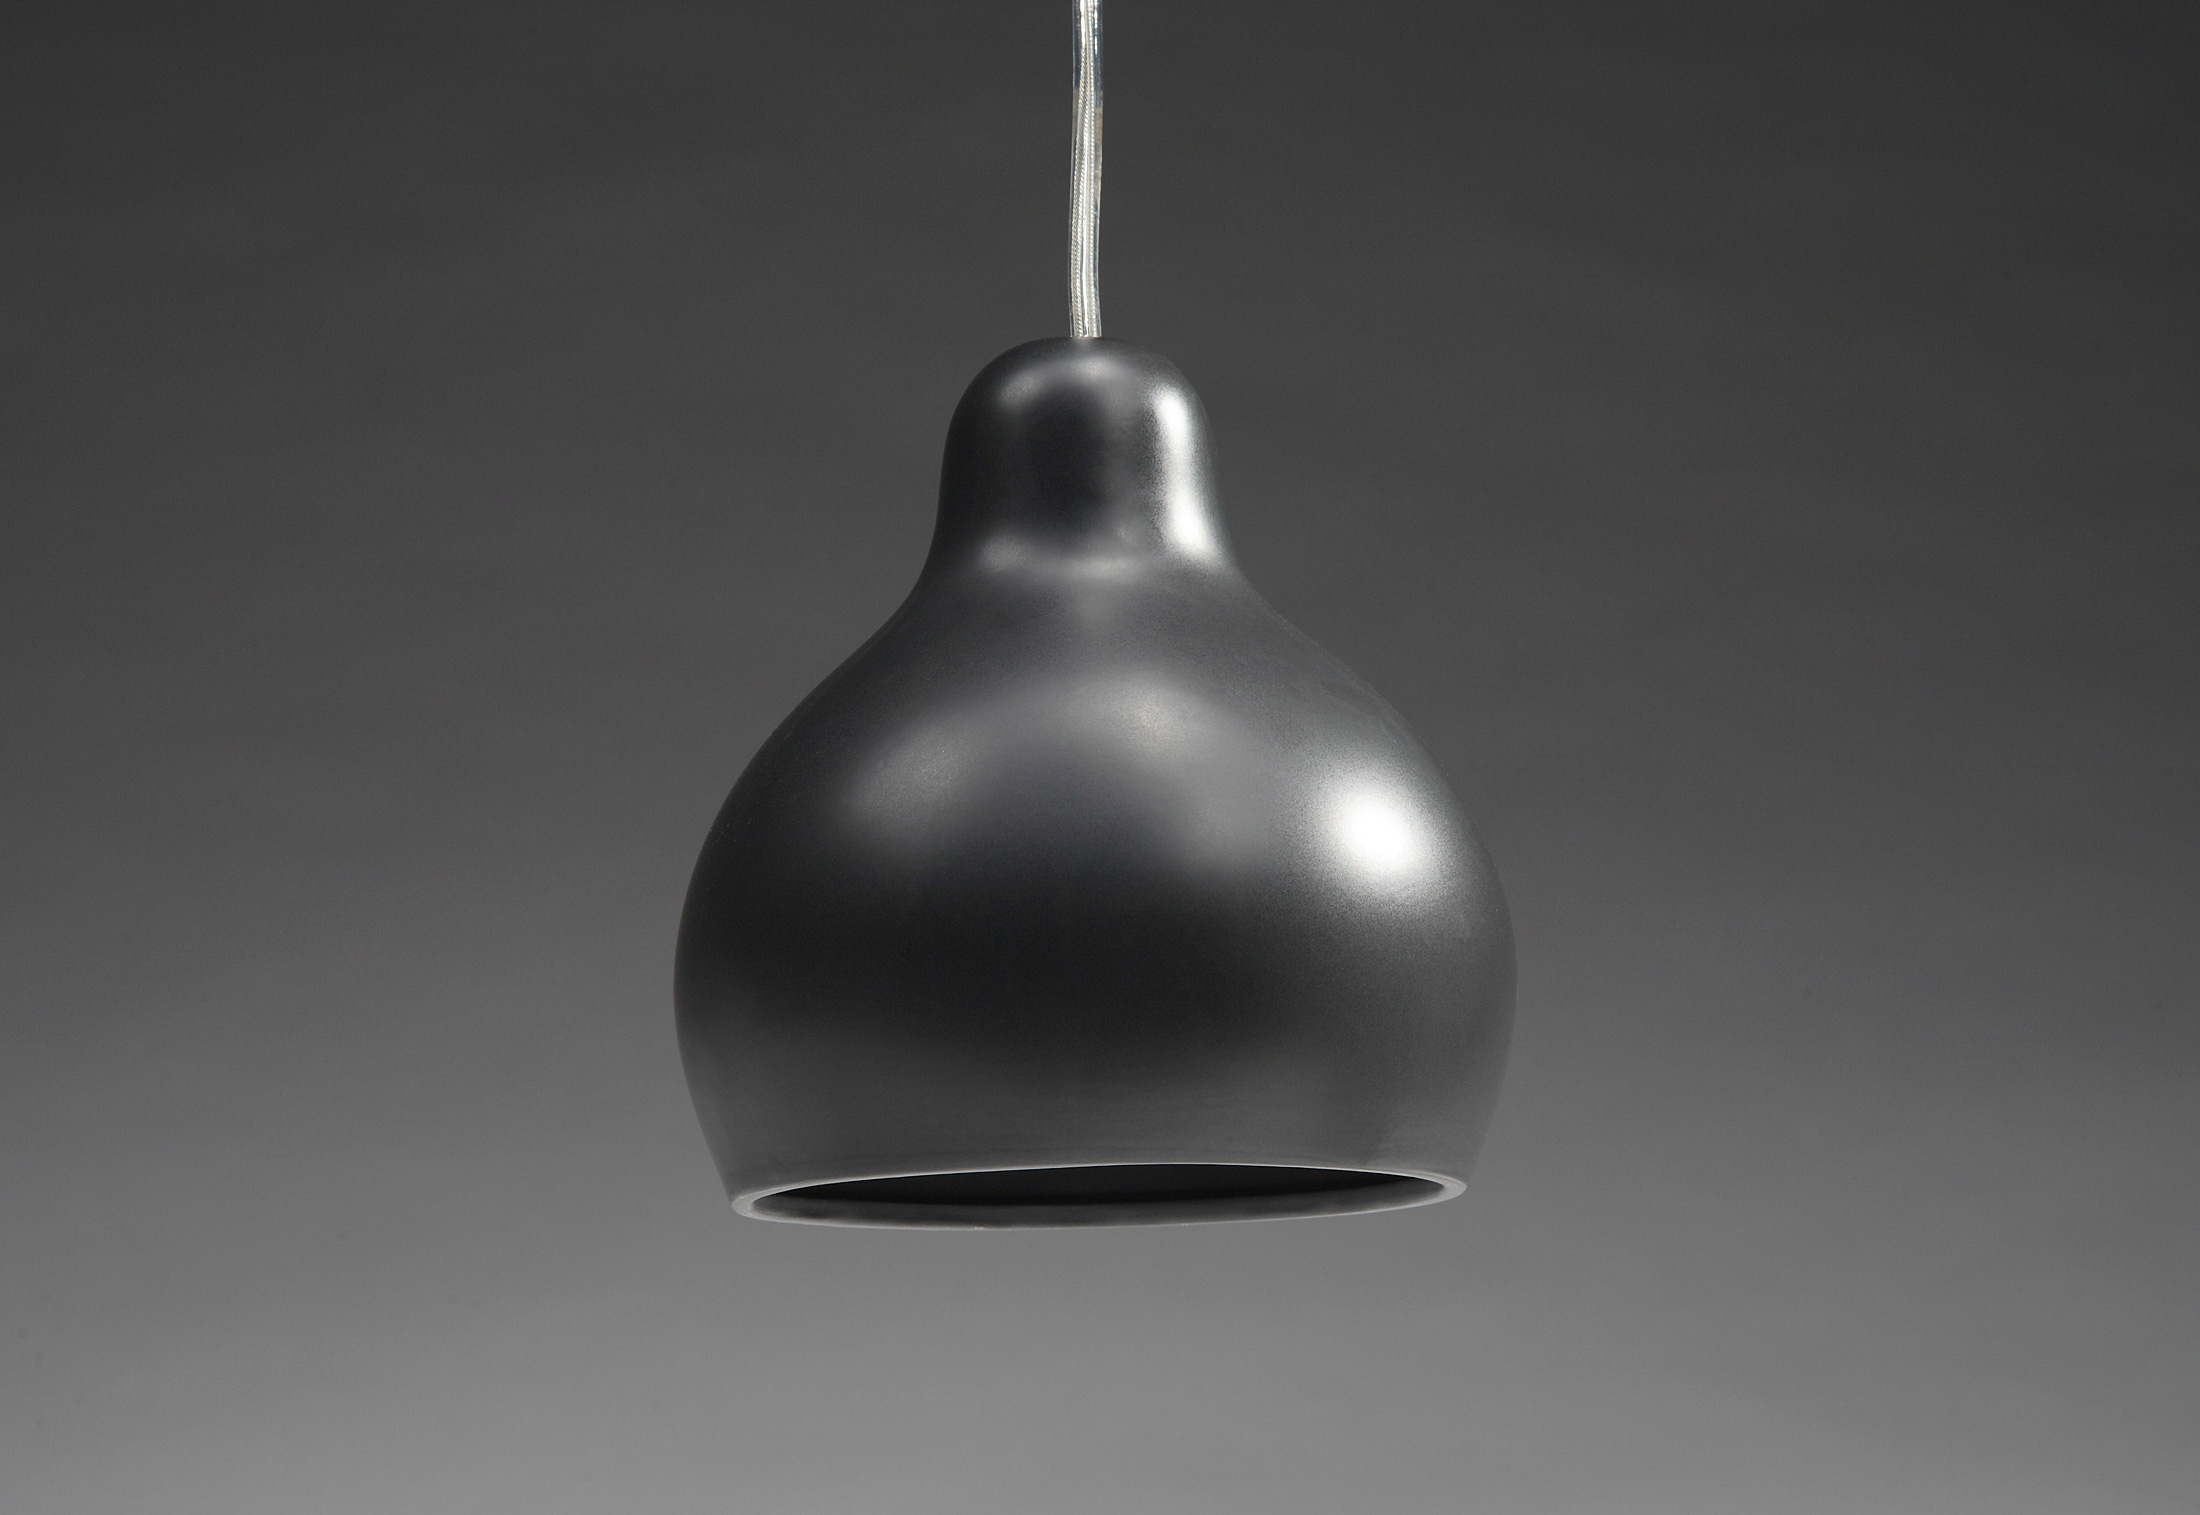 lampe-300dpi-5 Spannende Lampen Frankfurt Am Main Dekorationen